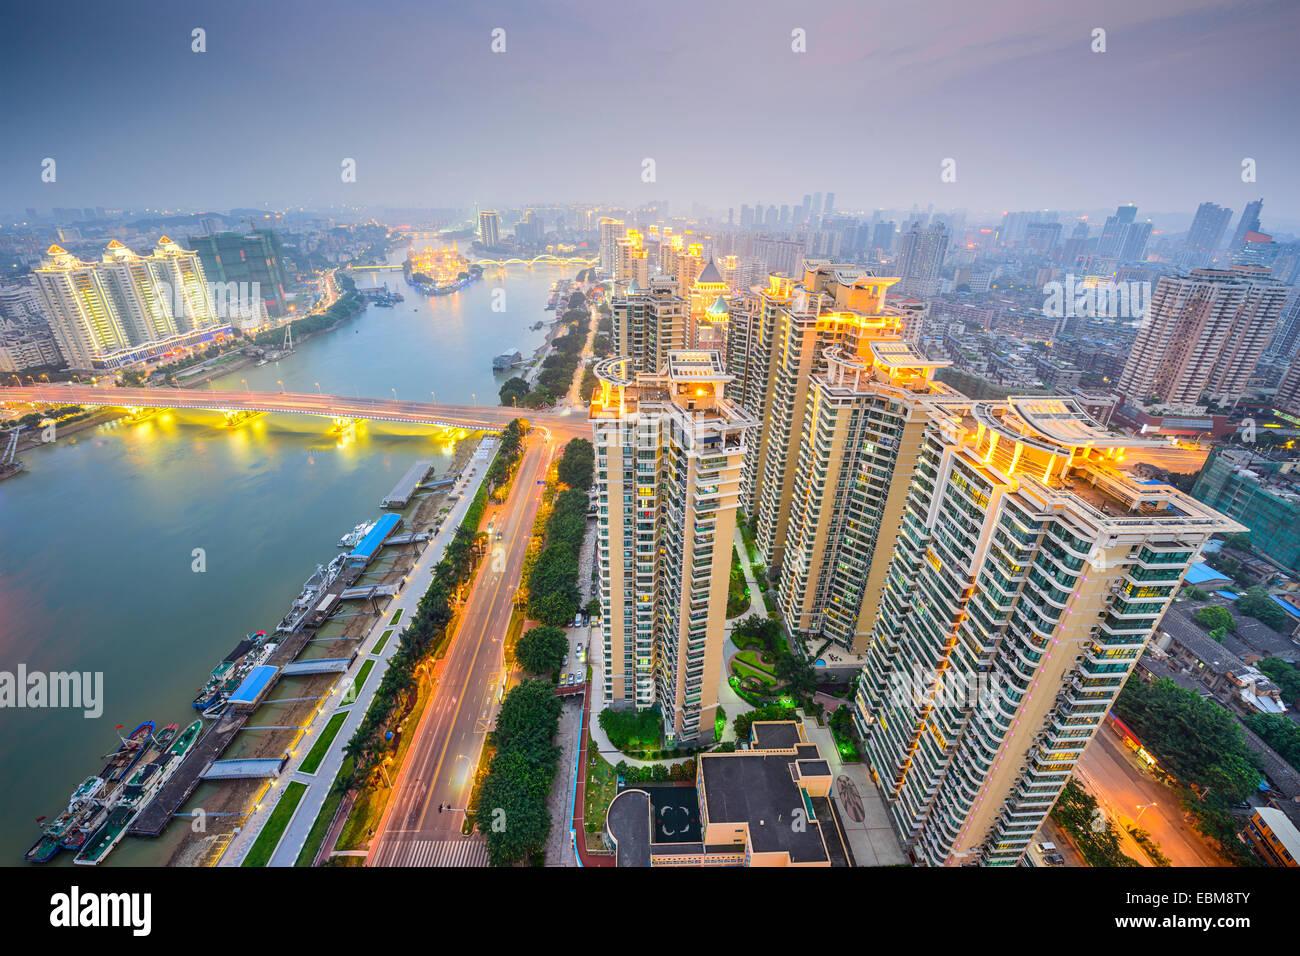 Fuzhou, China cityscape overlooking the Ming River. - Stock Image